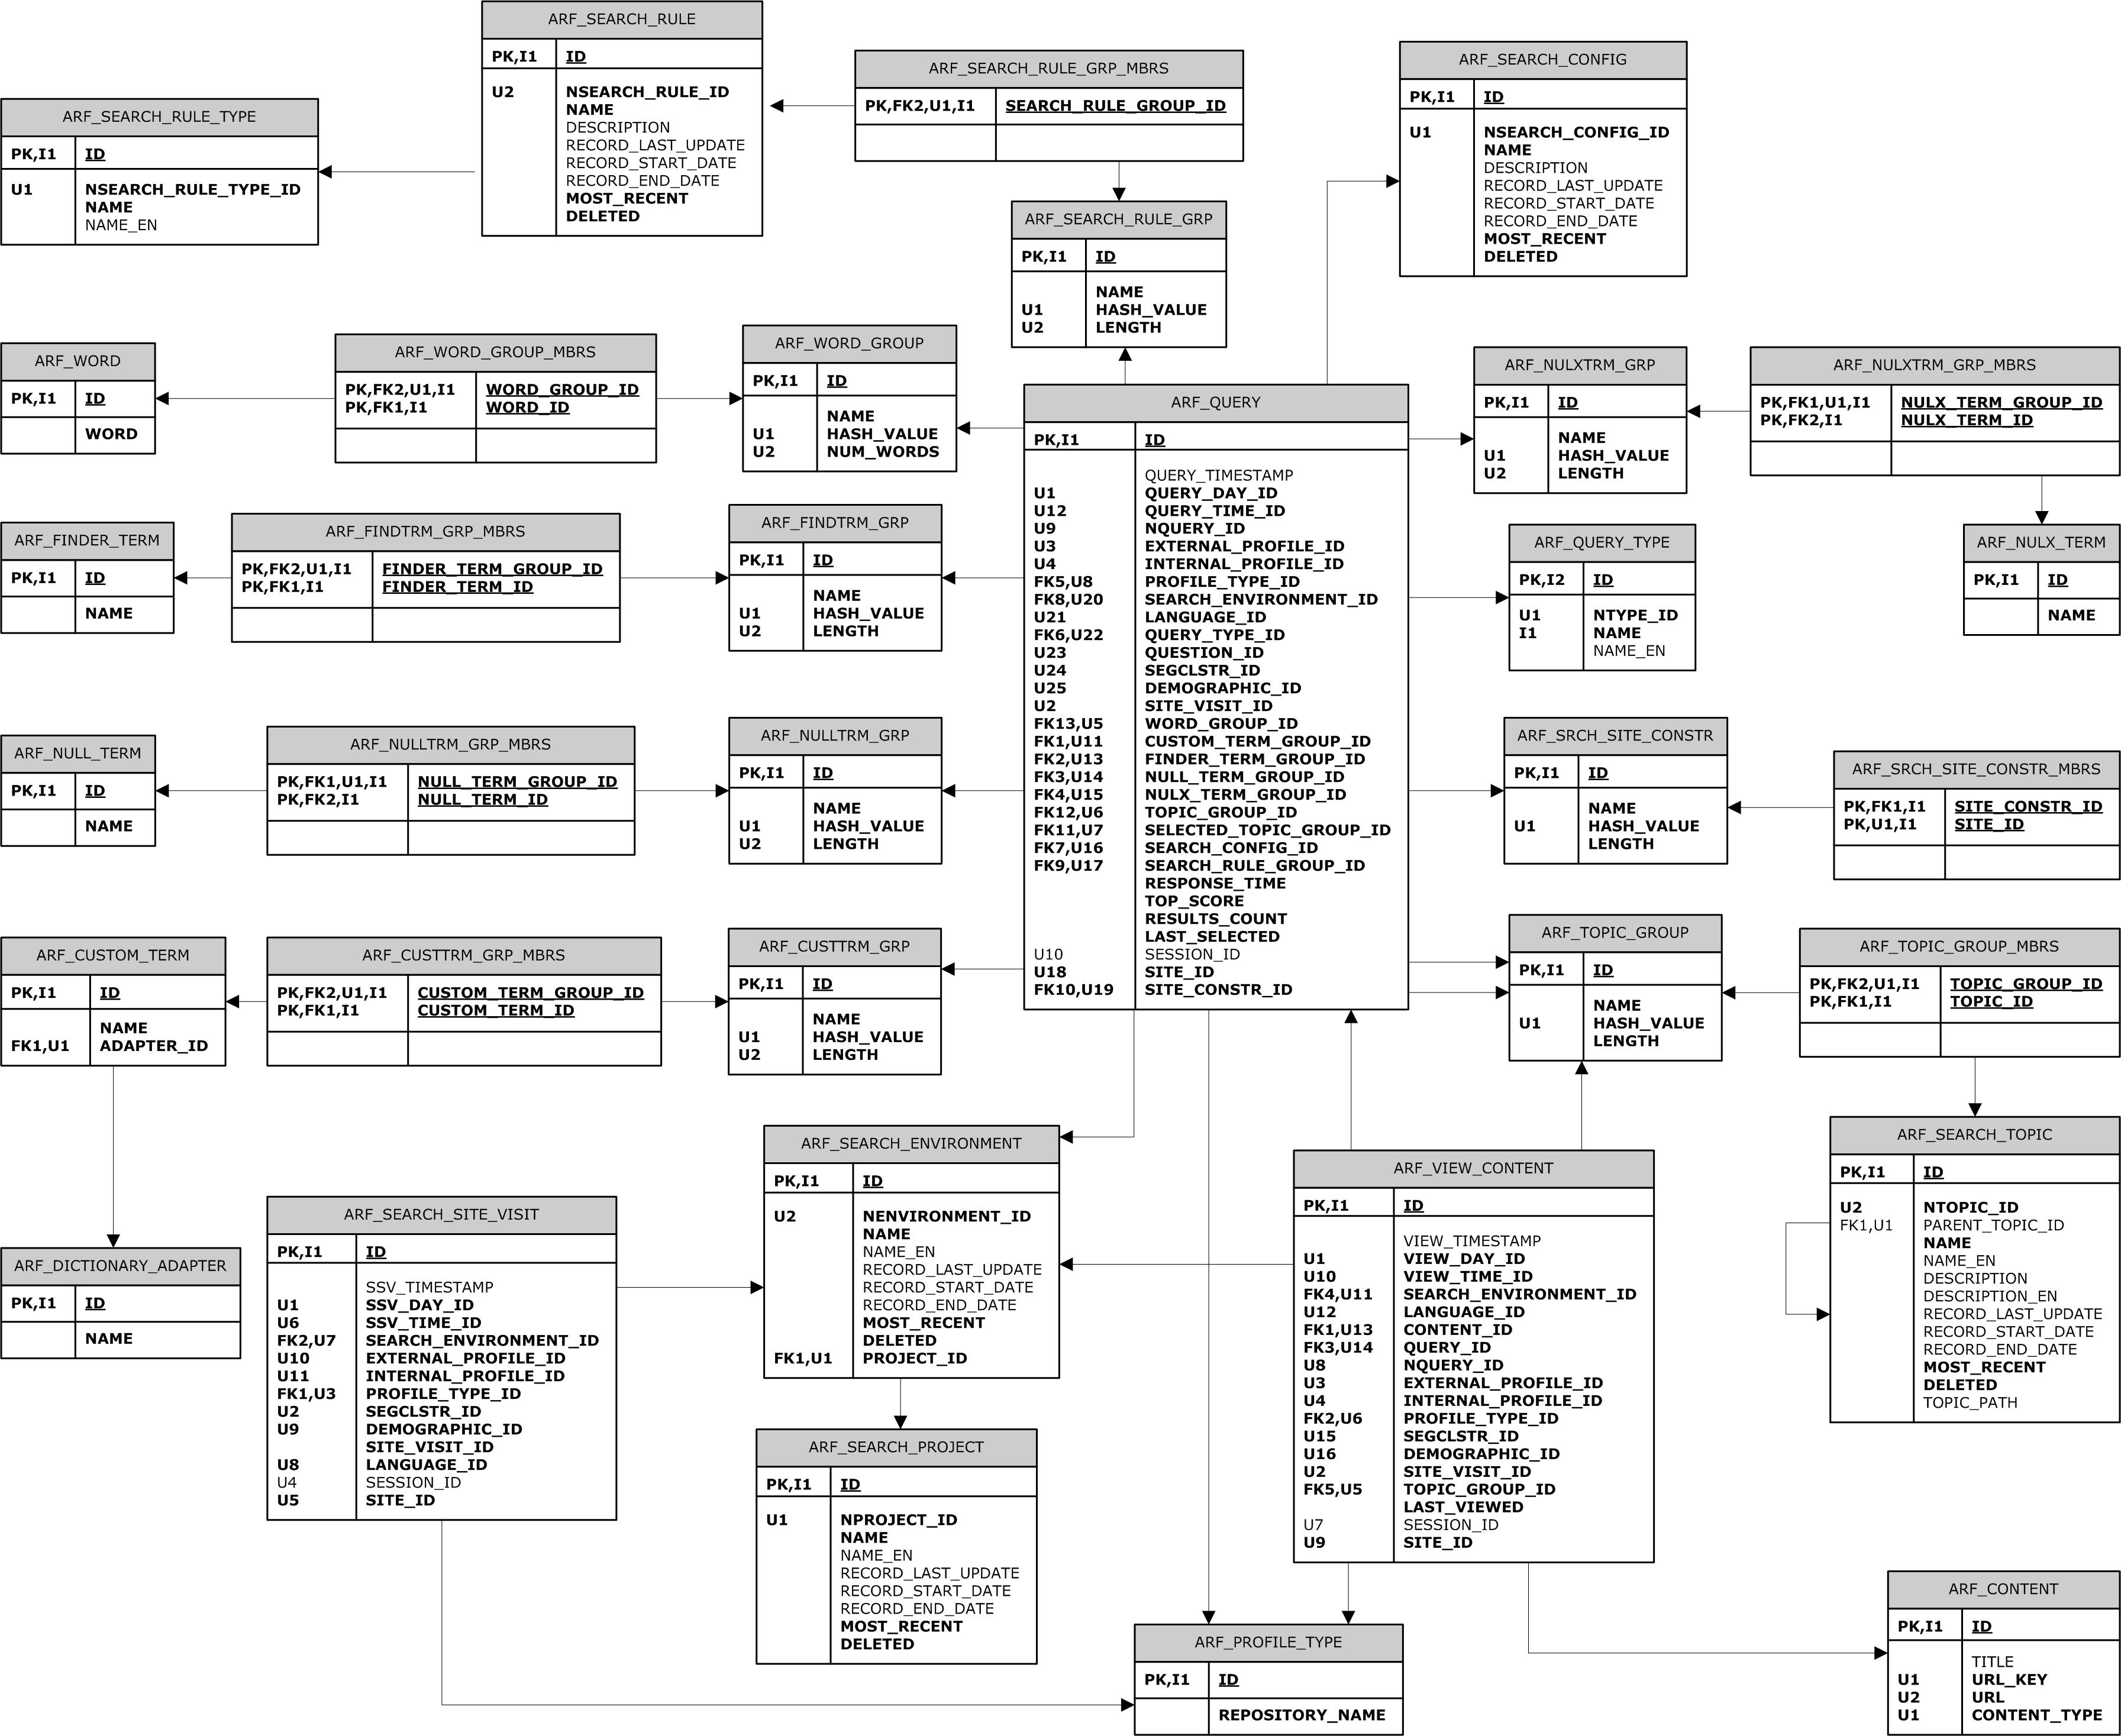 Oracle Atg Web Commerce - Search Erd intended for Er Diagram For Database Tables